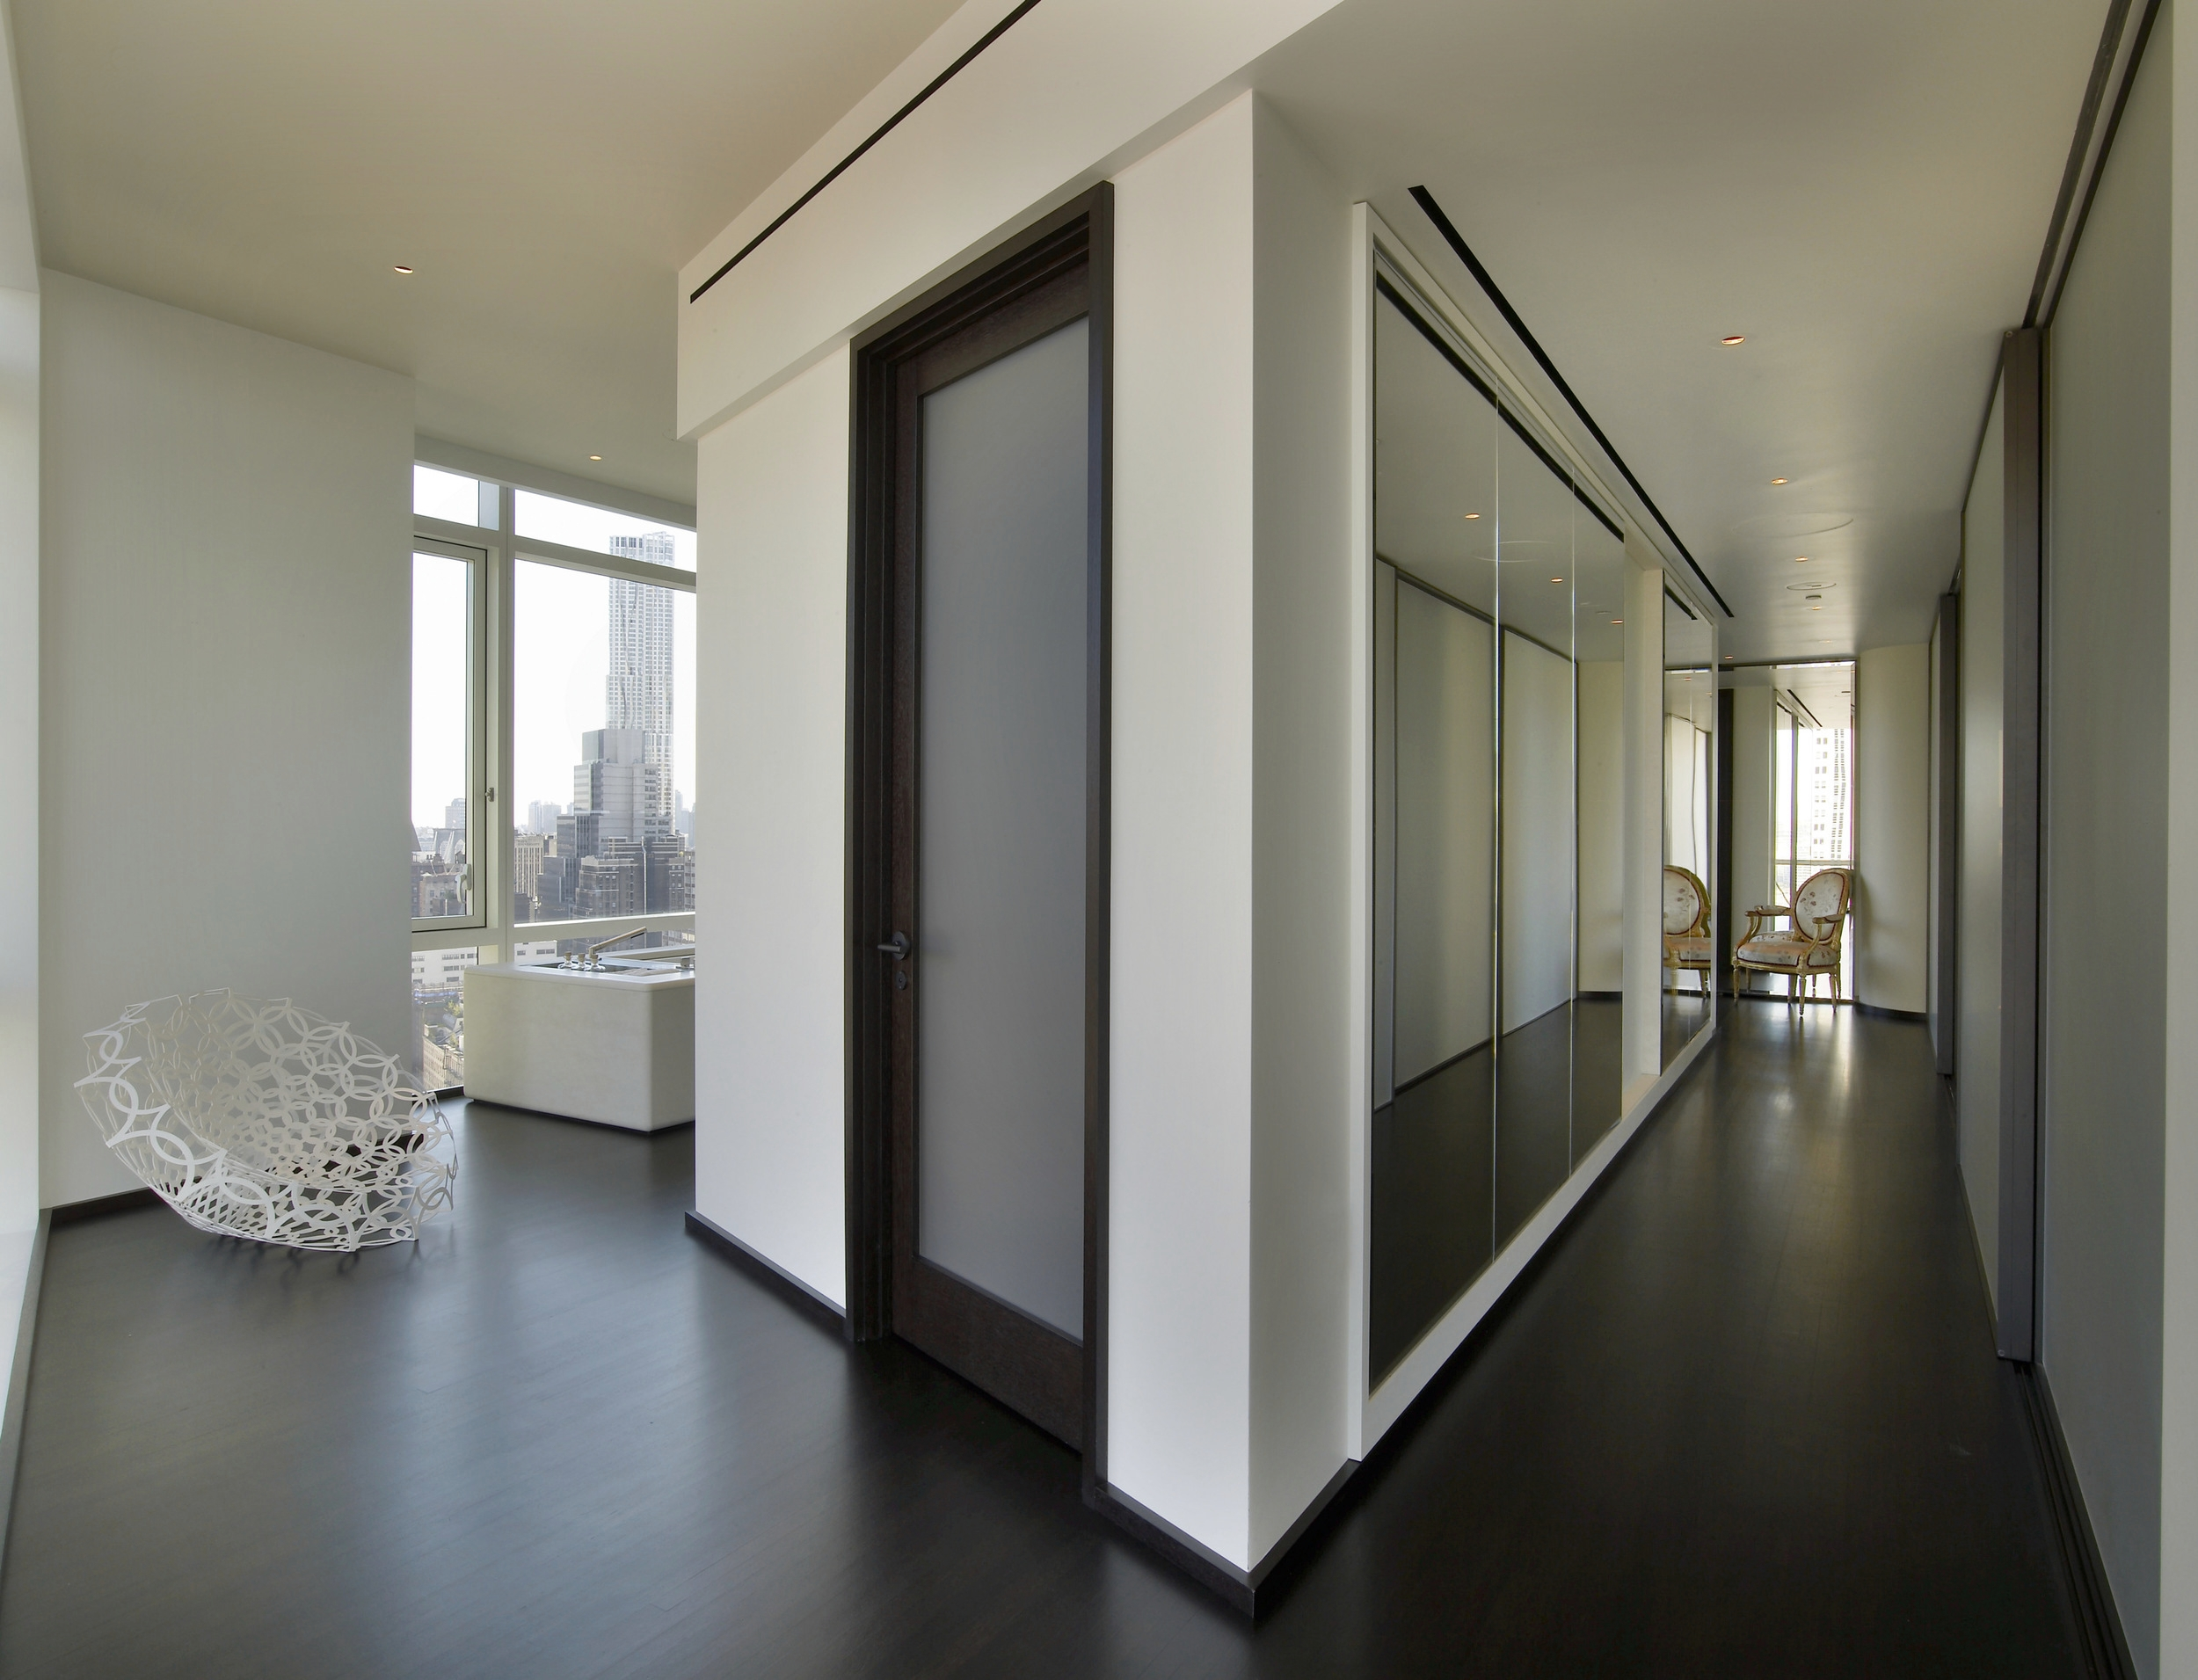 Chambers Apartment Hallway